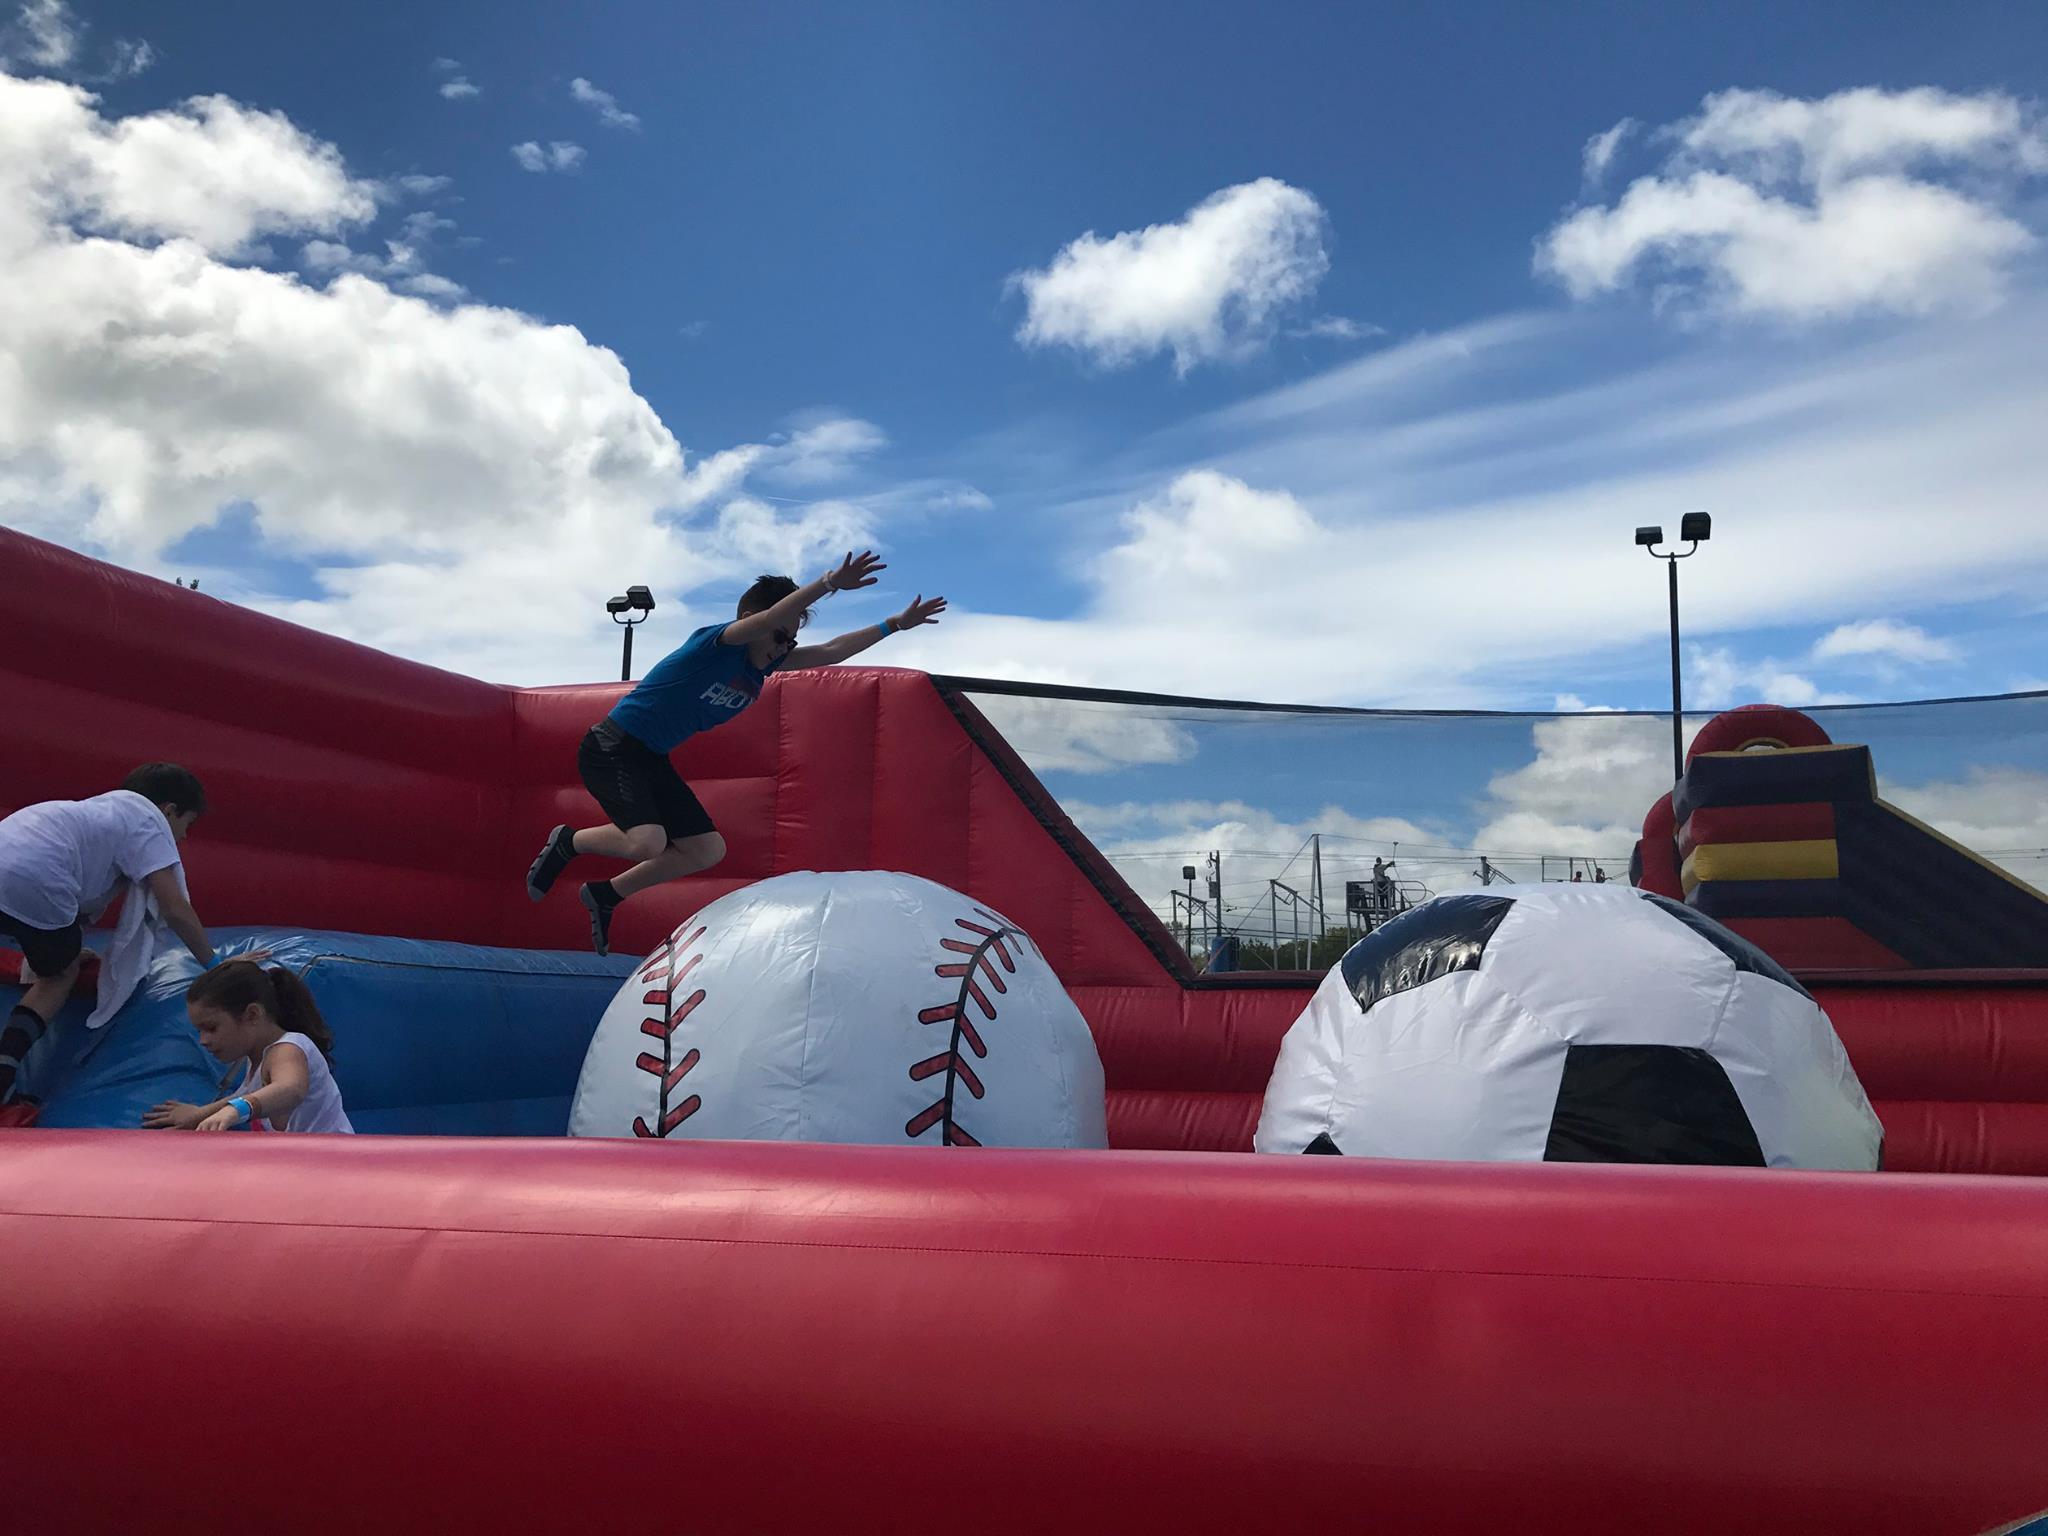 Cape Cod Inflatable Park